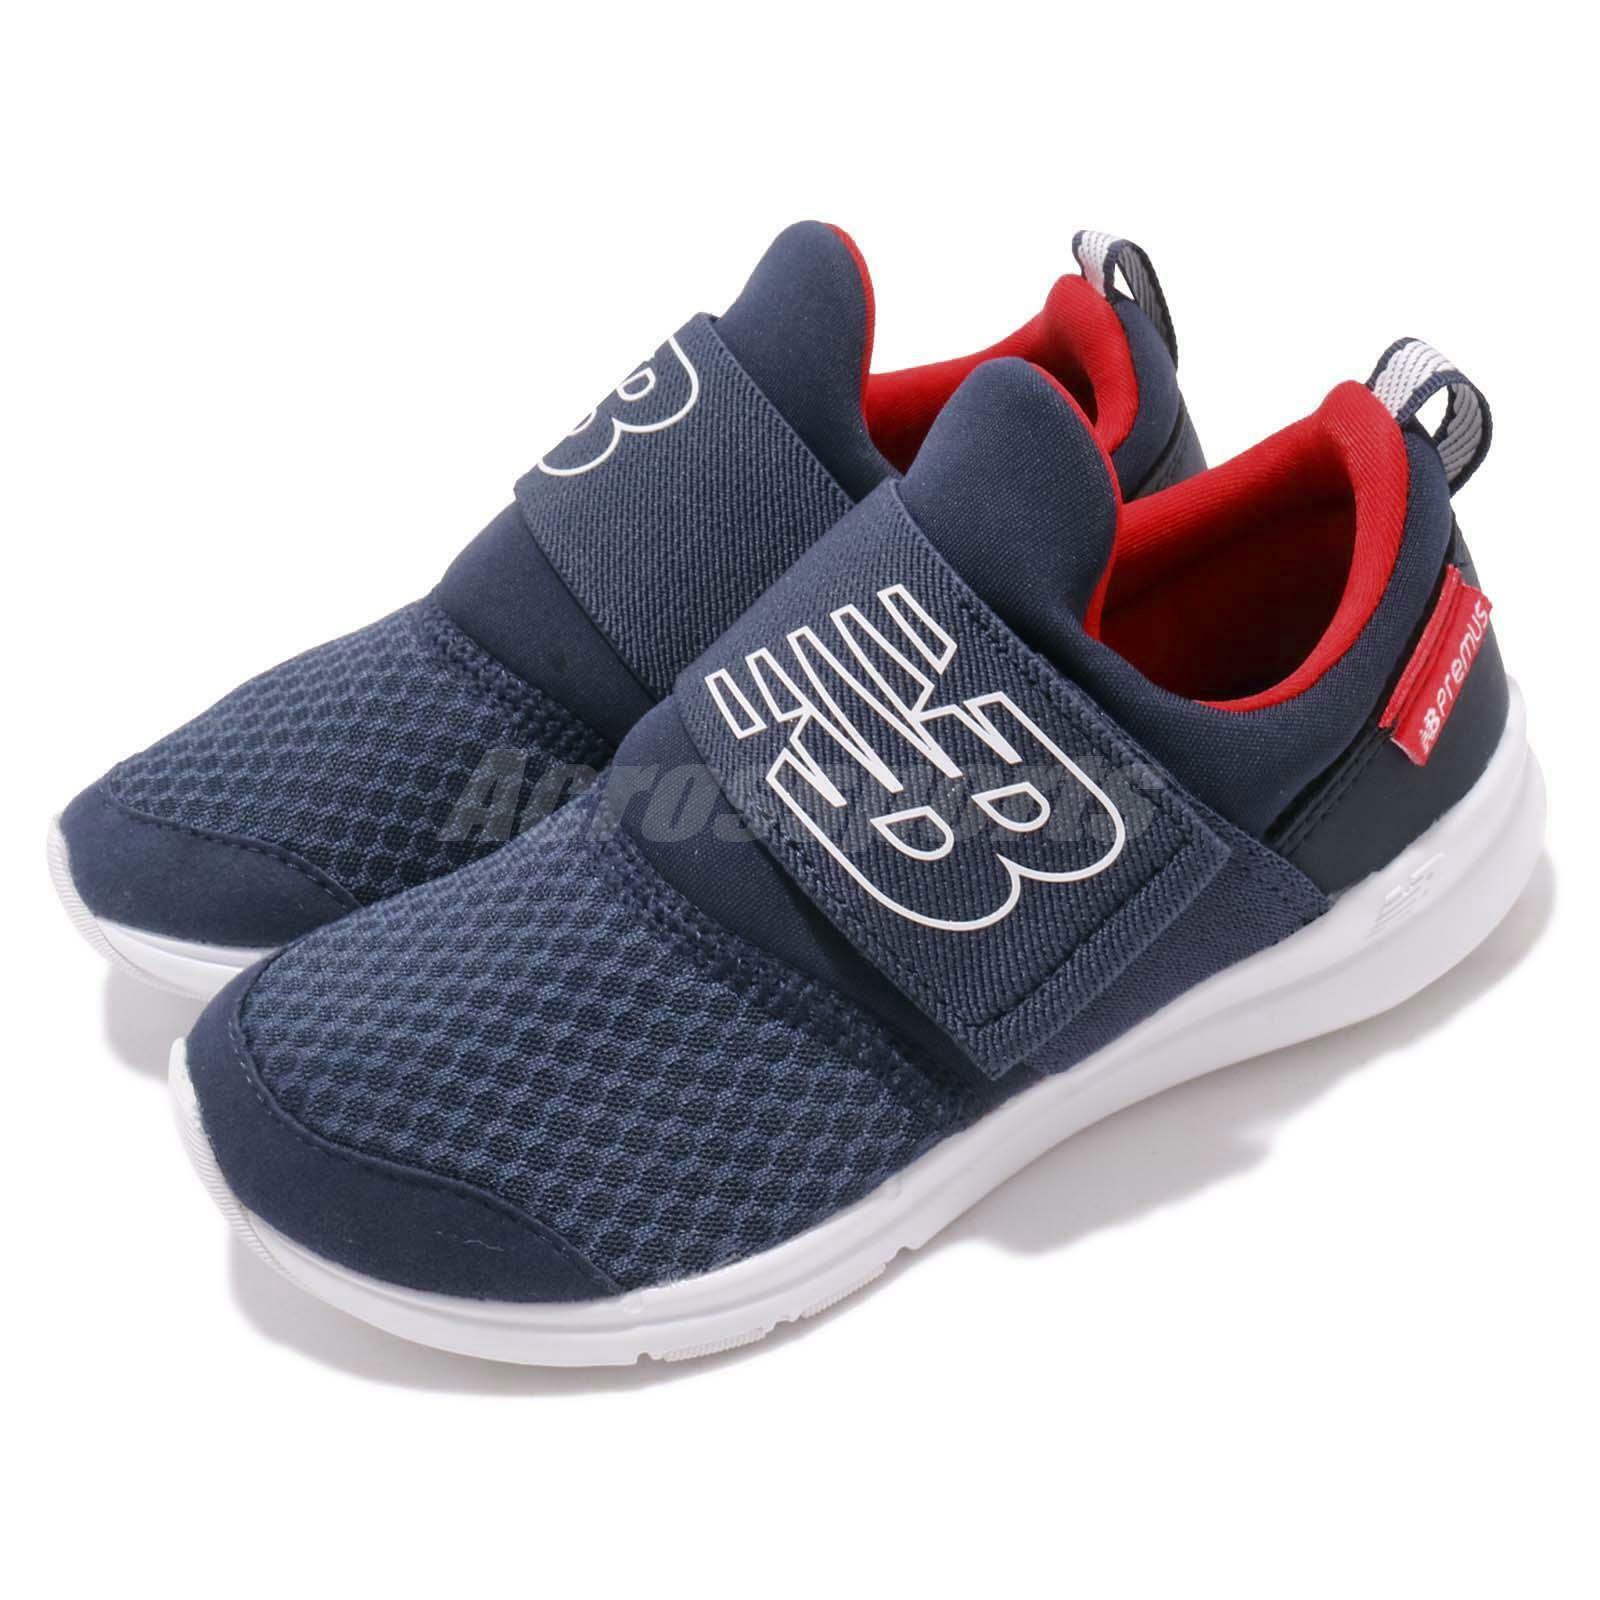 New balance popresnv W W W Ancho Azul Marino Rojo blancoo Niño Preescolar Zapatos Tenis popresnvw  venta mundialmente famosa en línea